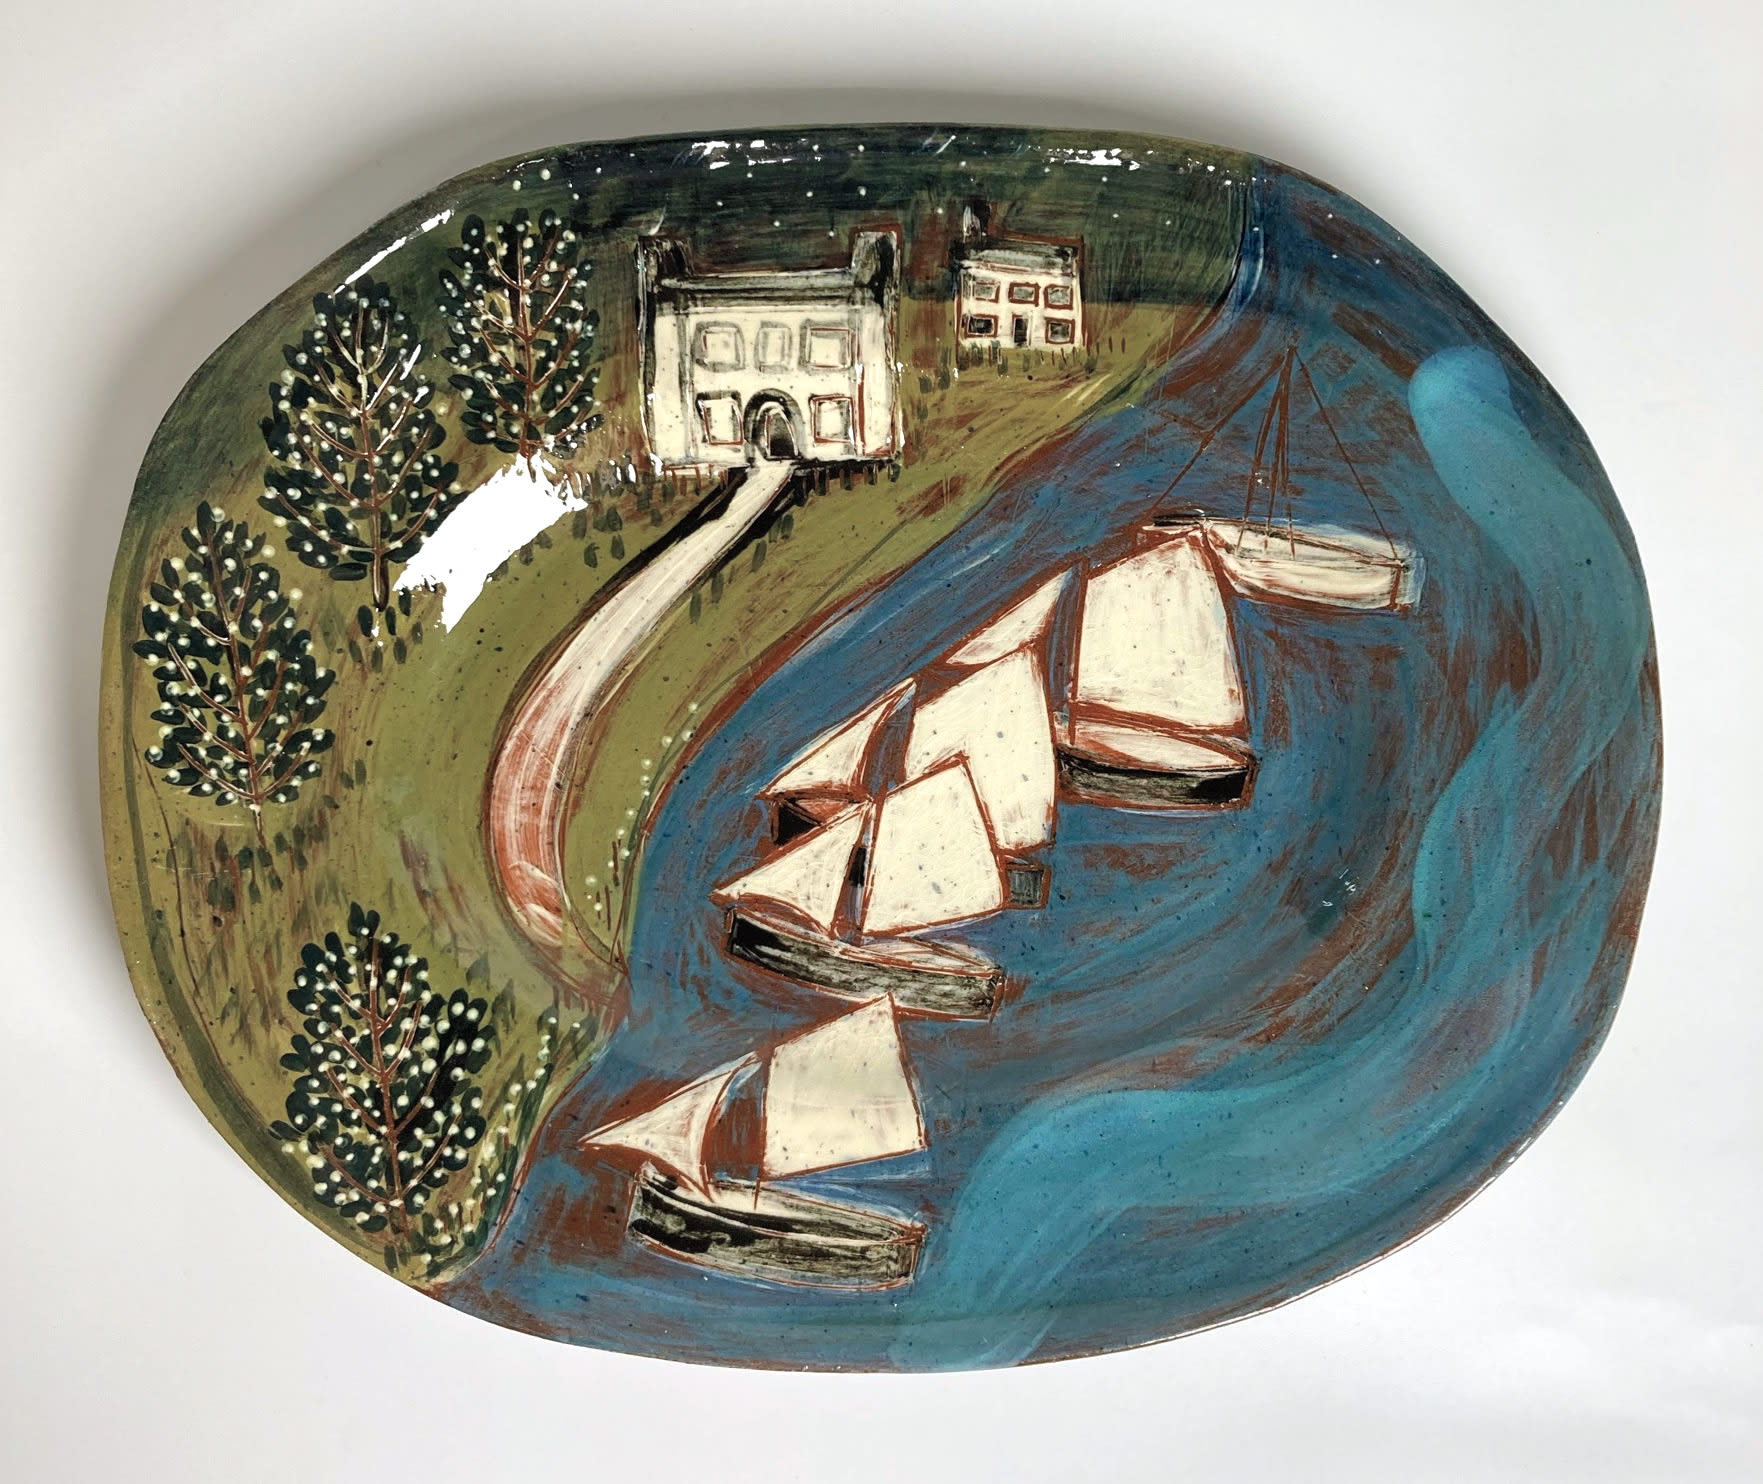 "<span class=""link fancybox-details-link""><a href=""/artists/428-anne-barrell/works/7688-anne-barrell-by-the-shore-2021/"">View Detail Page</a></span><div class=""artist""><strong>Anne Barrell</strong></div> <div class=""title""><em>By the Shore</em>, 2021</div> <div class=""medium"">handmade, hand-painted ceramic </div> <div class=""dimensions"">h. 26 x w. 32 cm </div><div class=""copyright_line"">Own Art: £15 x 10 Months, 0% APR</div>"